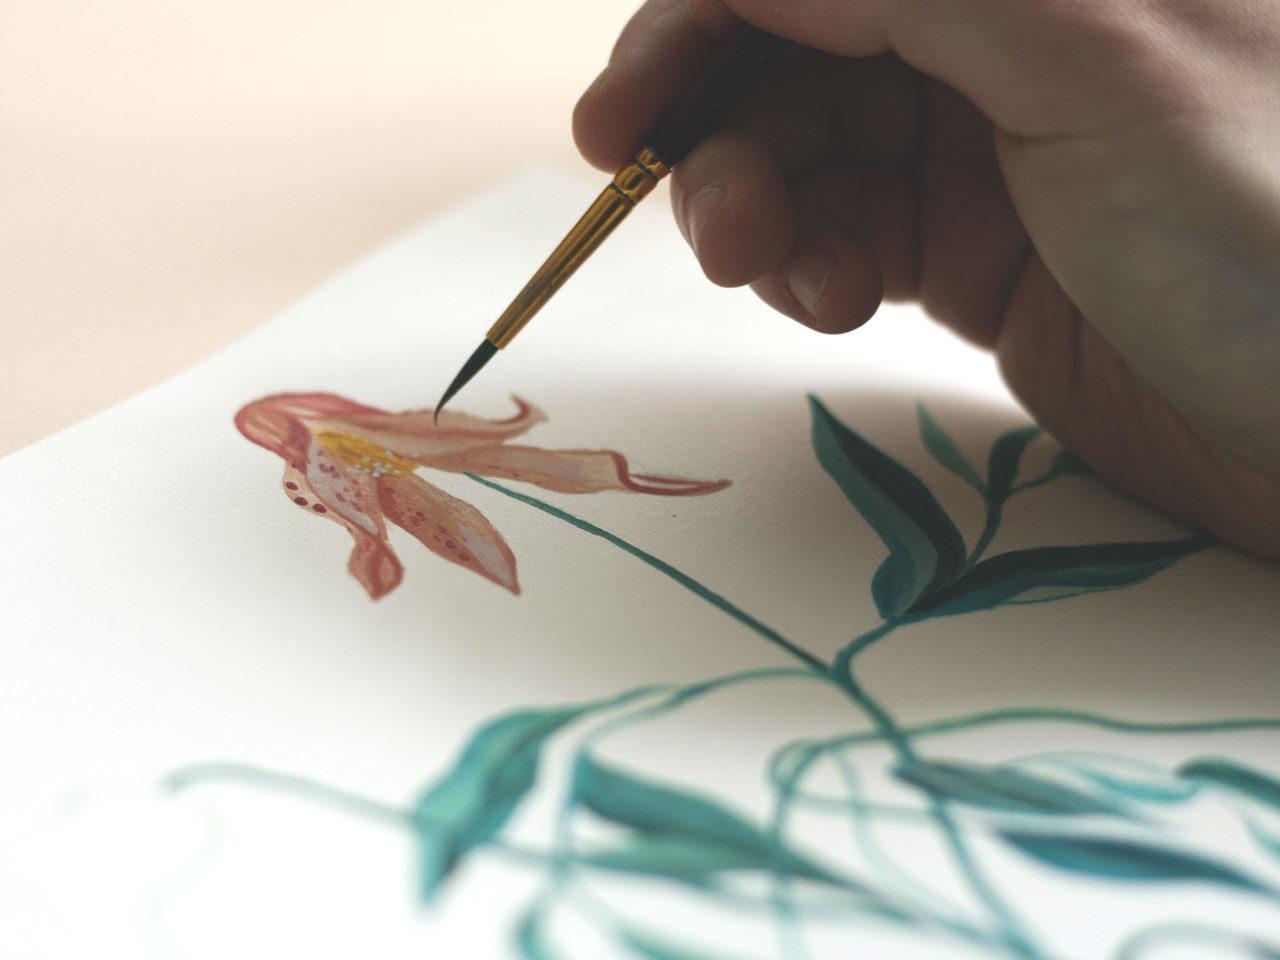 Dessin de l'illustratrice Léa Pivert